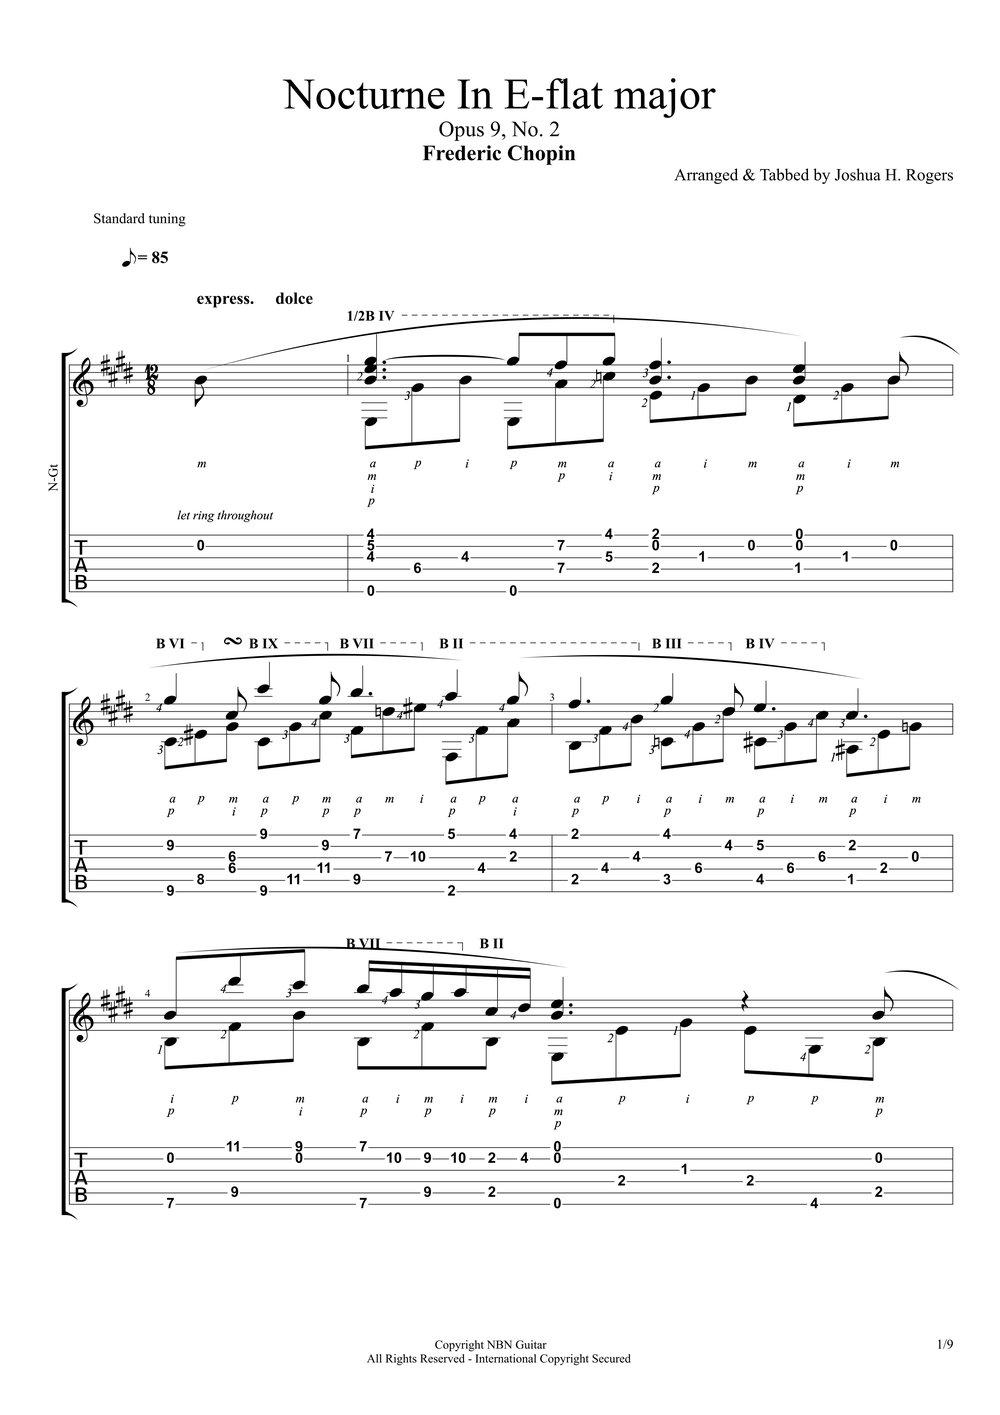 Nocturne in E-flat major (Sheet Music & Tabs)-p03.jpg